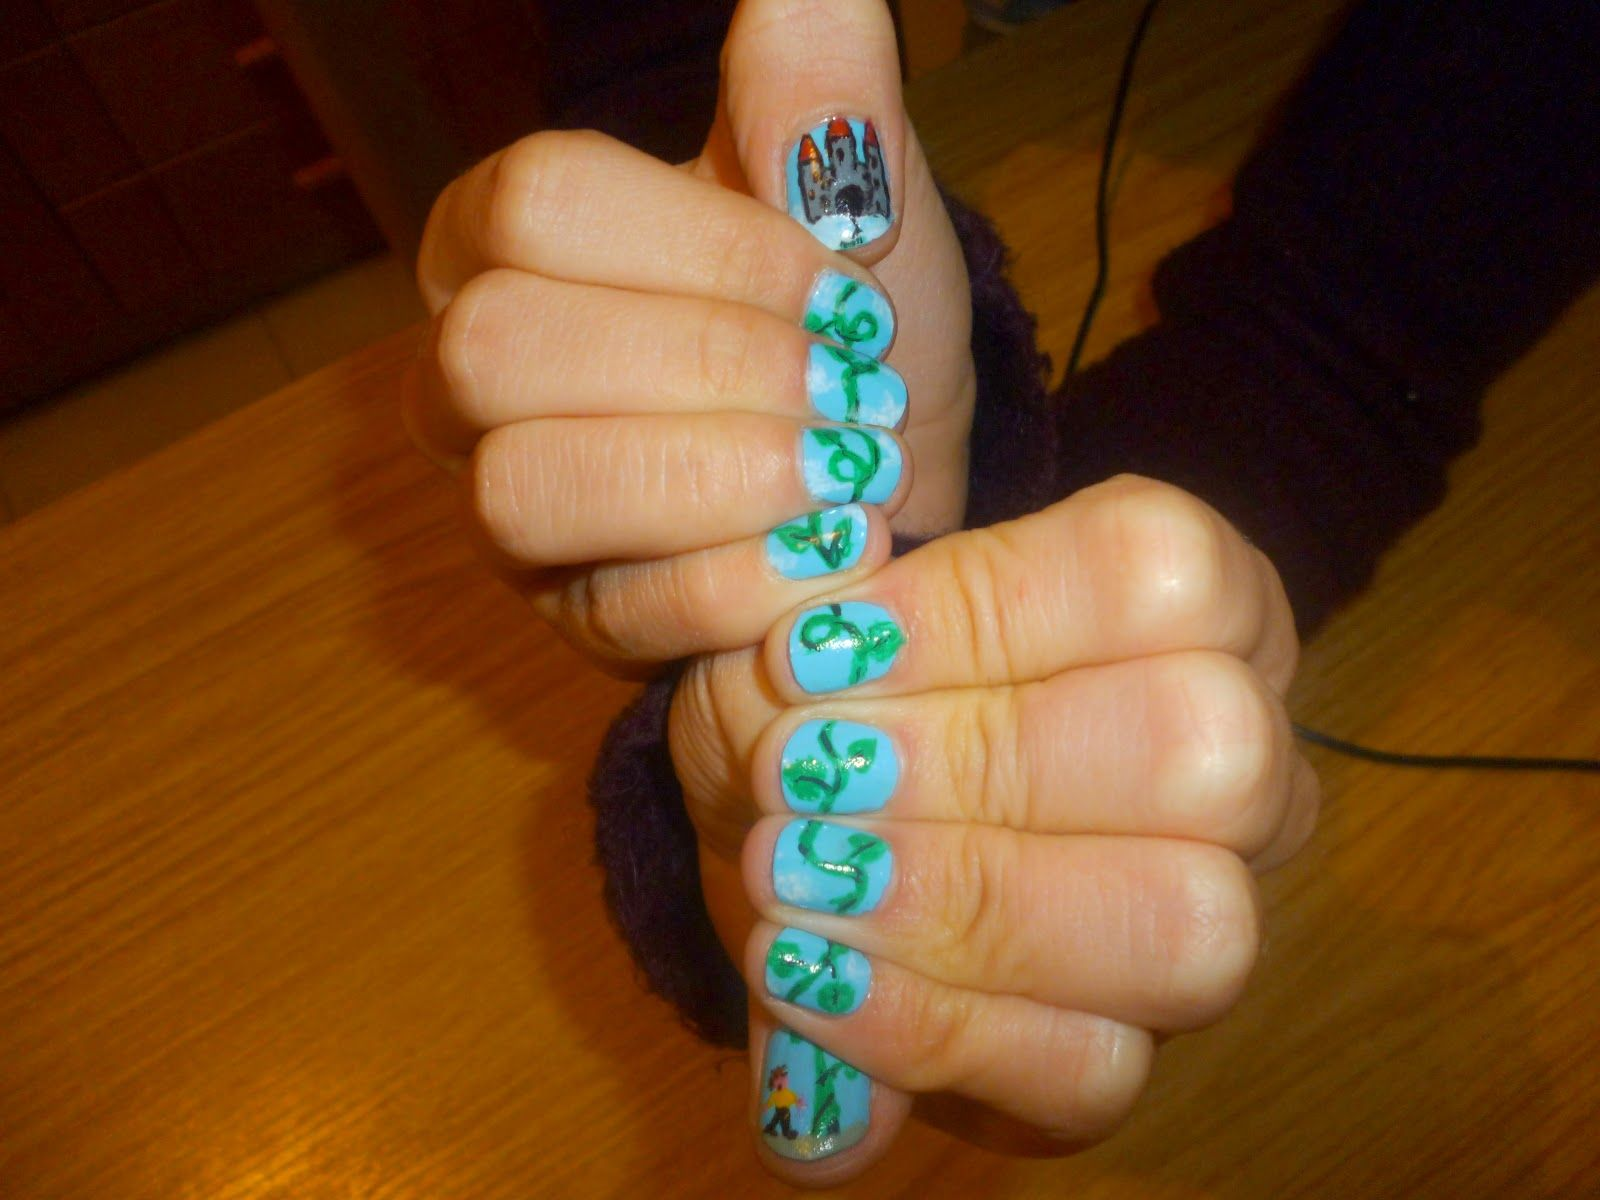 Creative nail design love this creative nail design across all creative nail design love this creative nail design across all nails awesome prinsesfo Choice Image